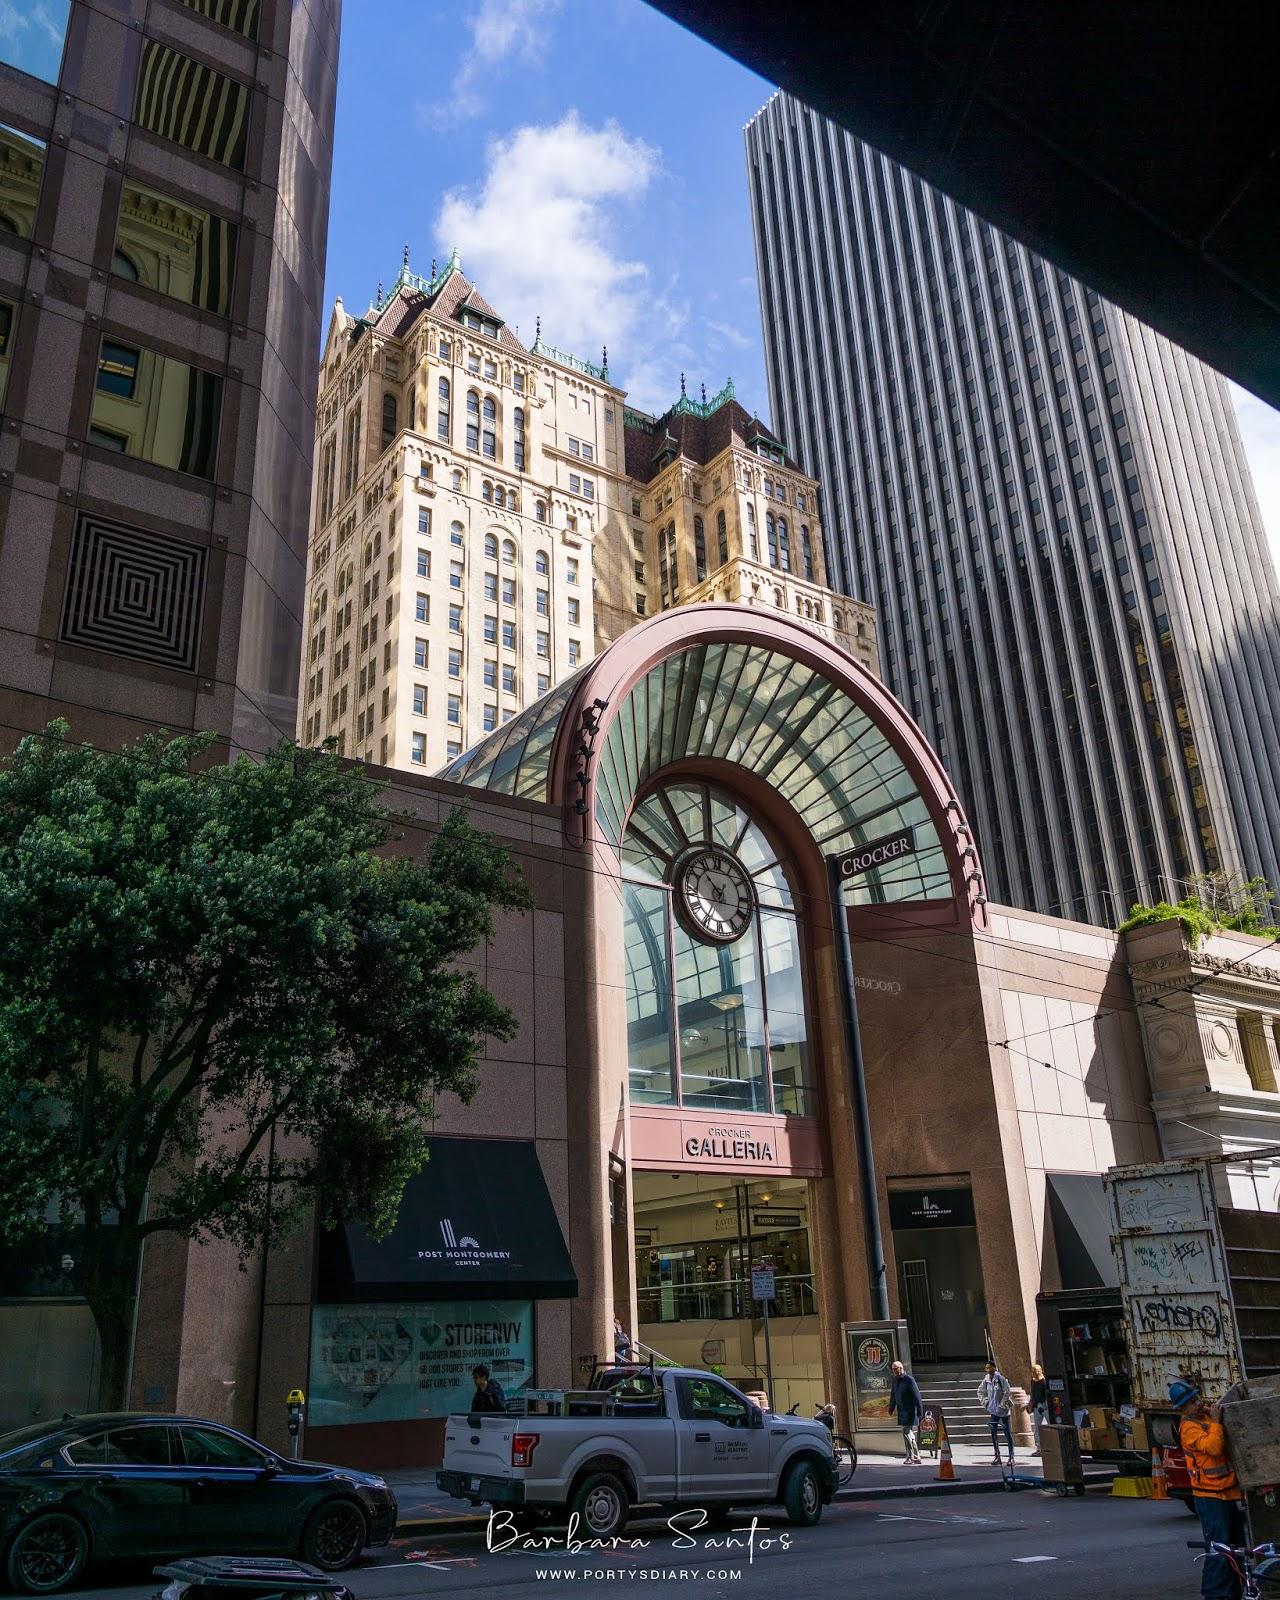 Crocker Galleria - Travel - A week in San Francisco.